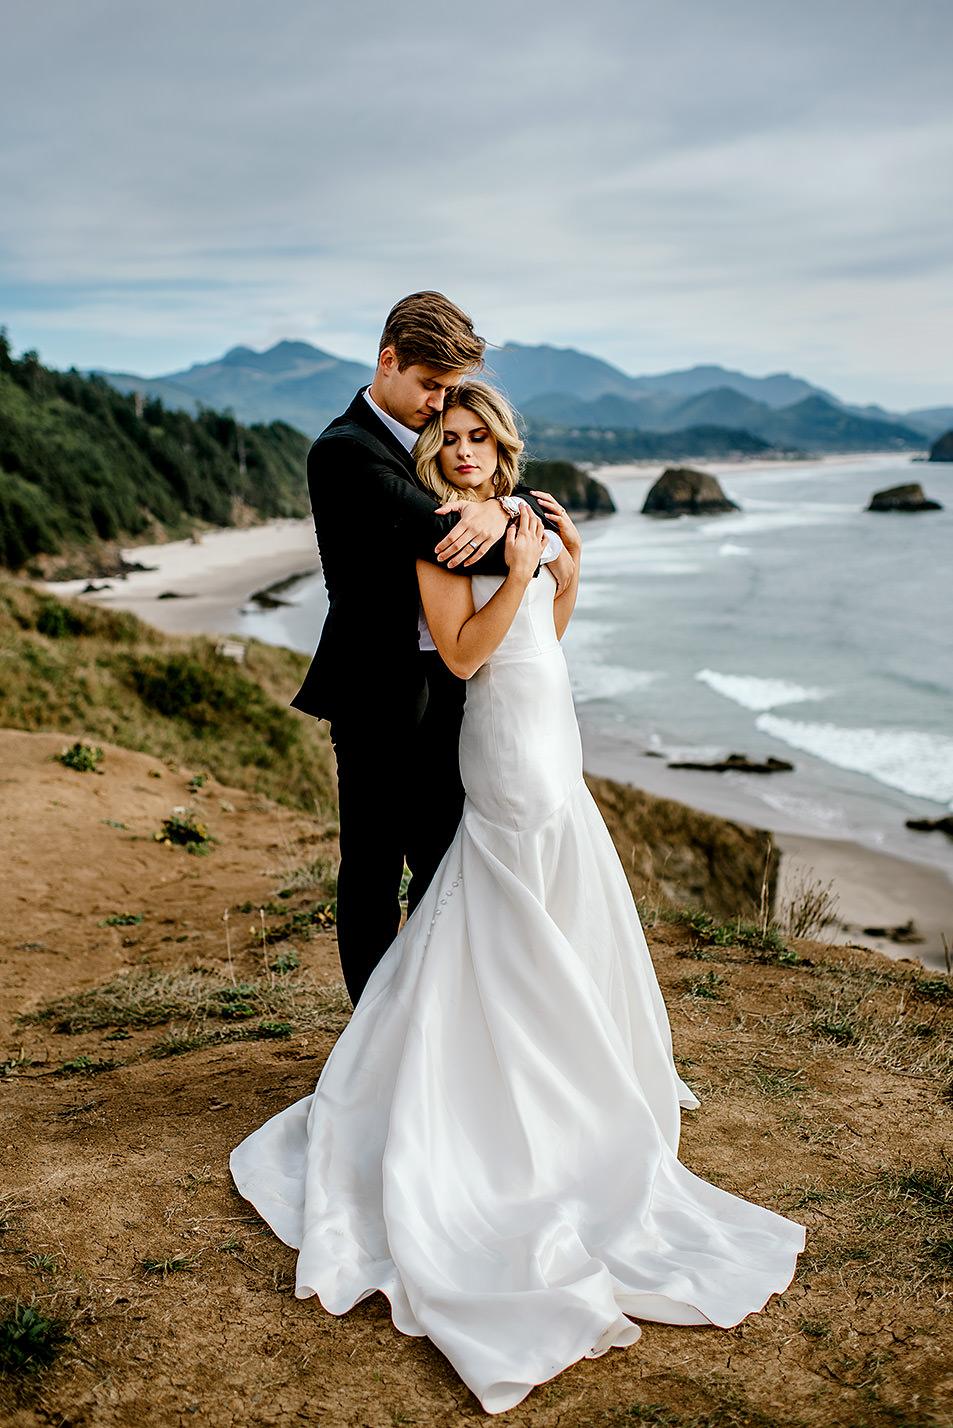 Jan-Tim-Cannon-Beach-wedding-photographer094.jpg